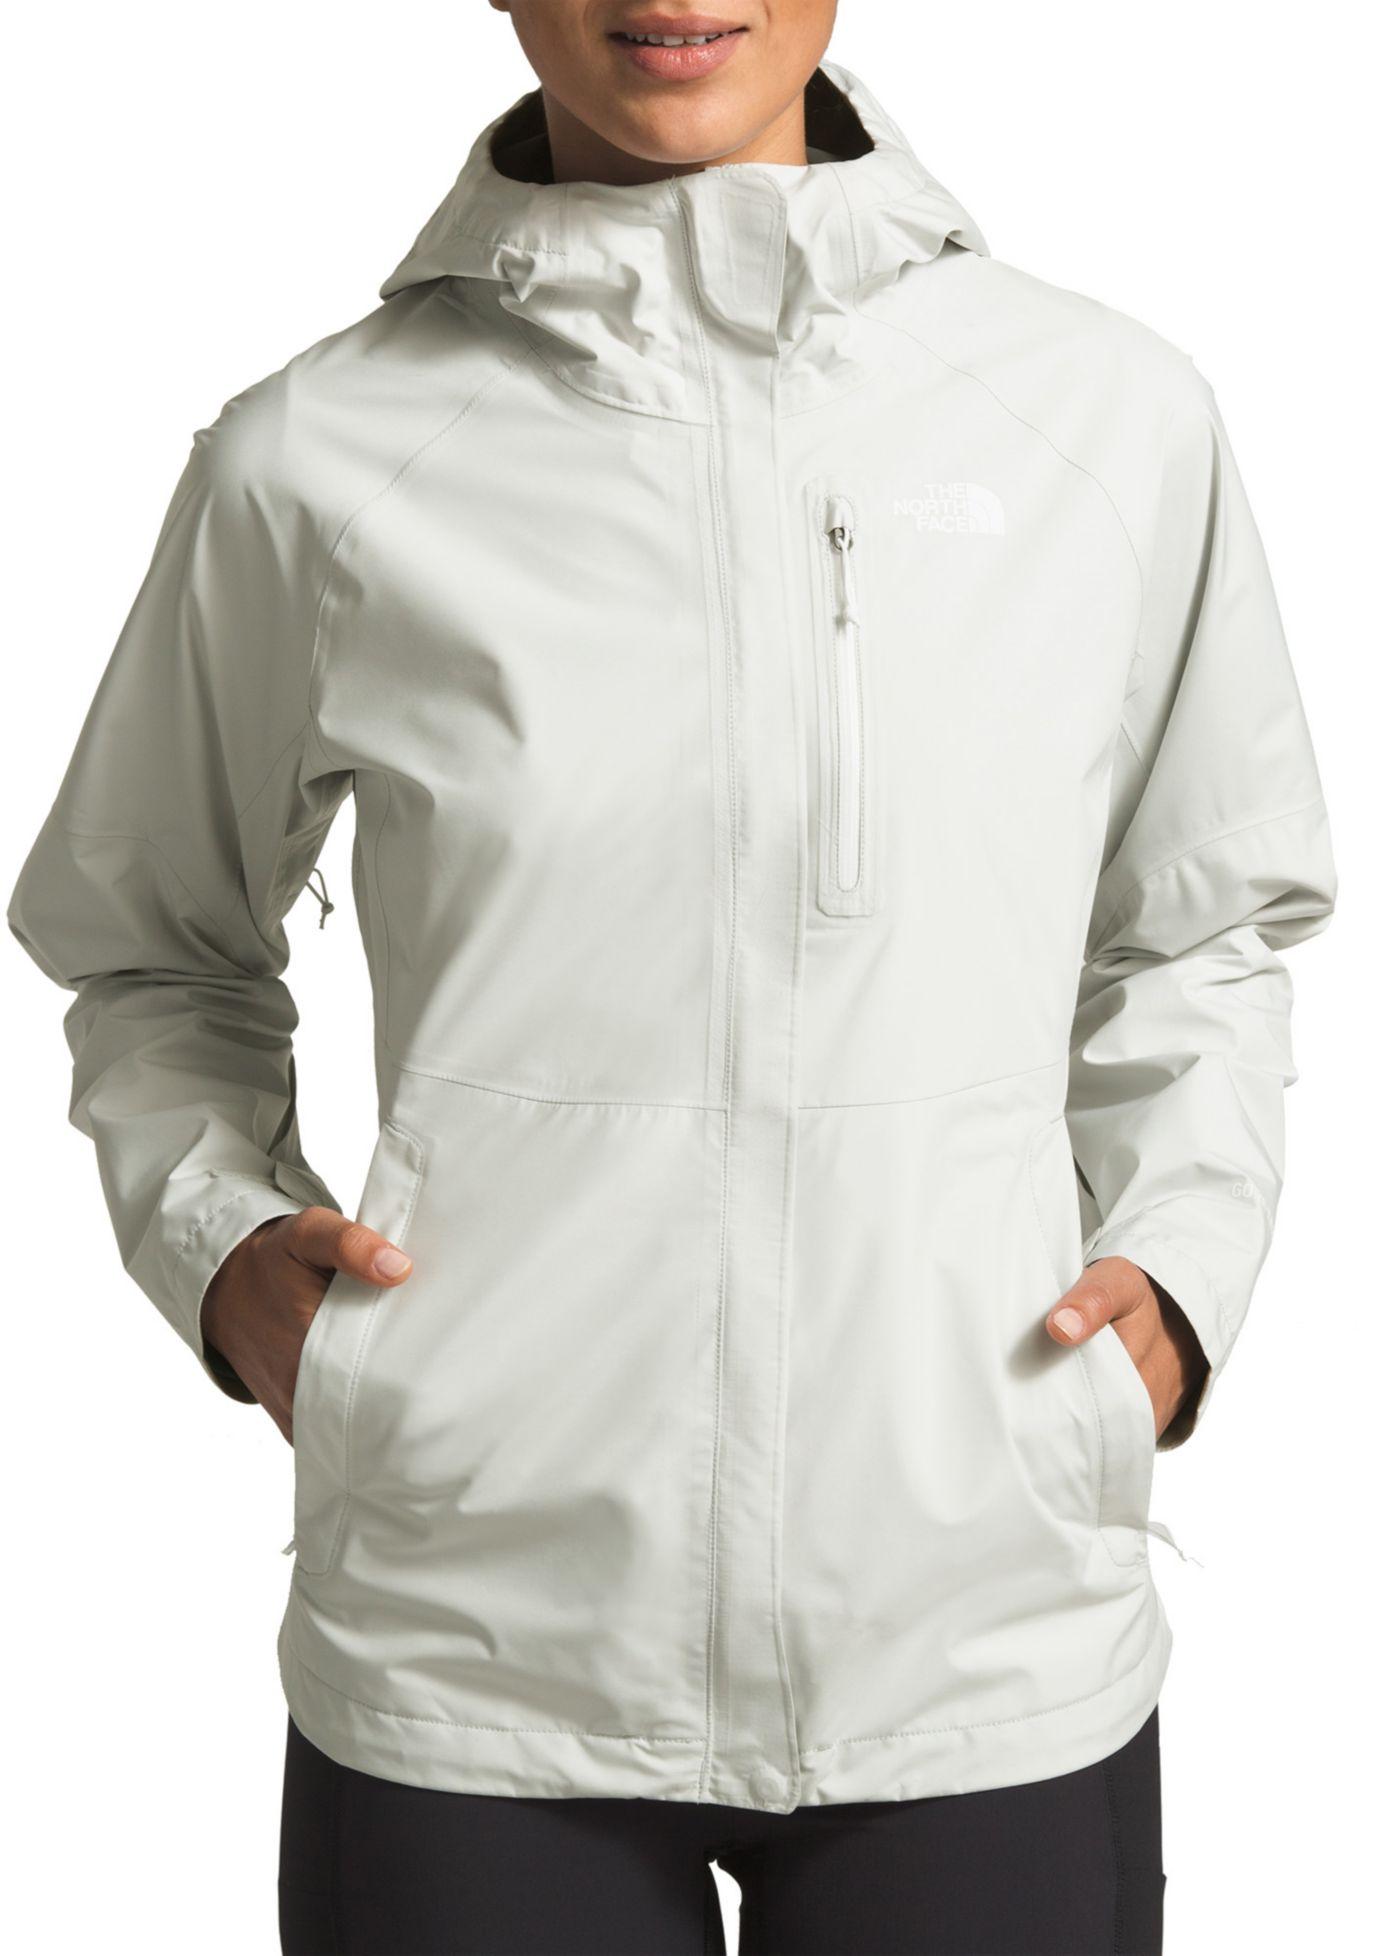 The North Face Women's Dryzzle Rain Jacket